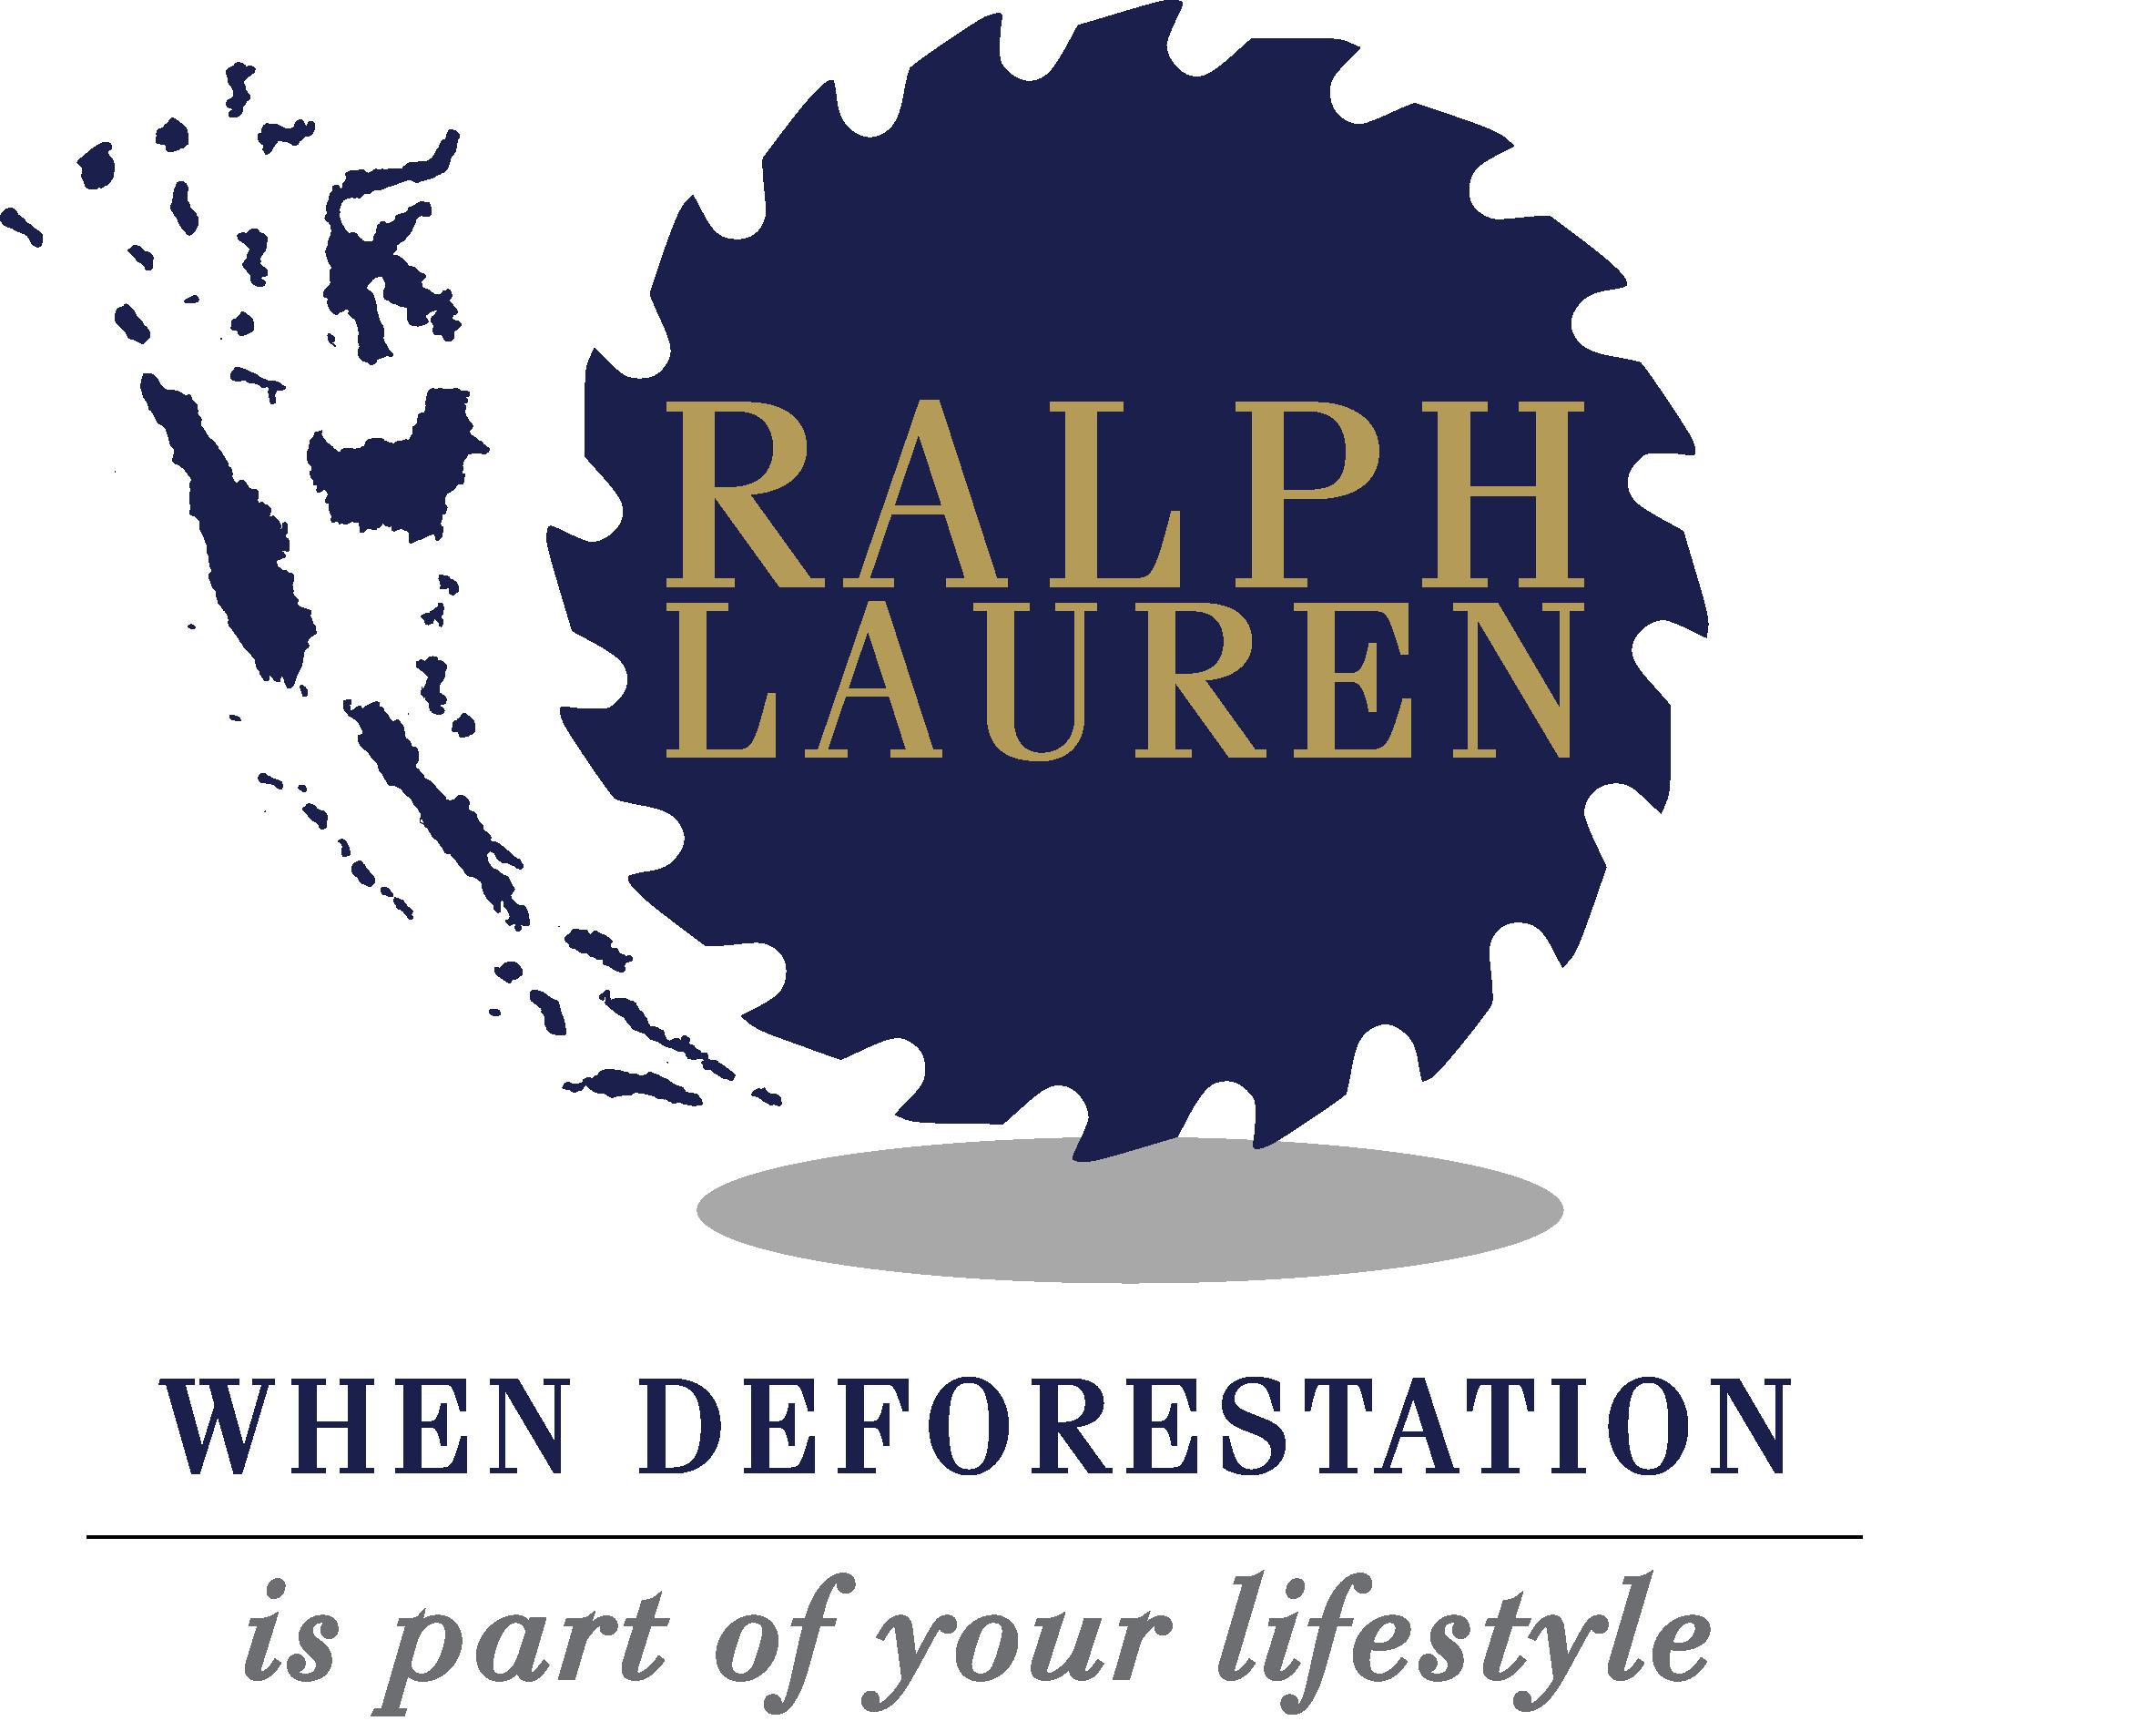 RALPH_LAUREN_sq_bl.png